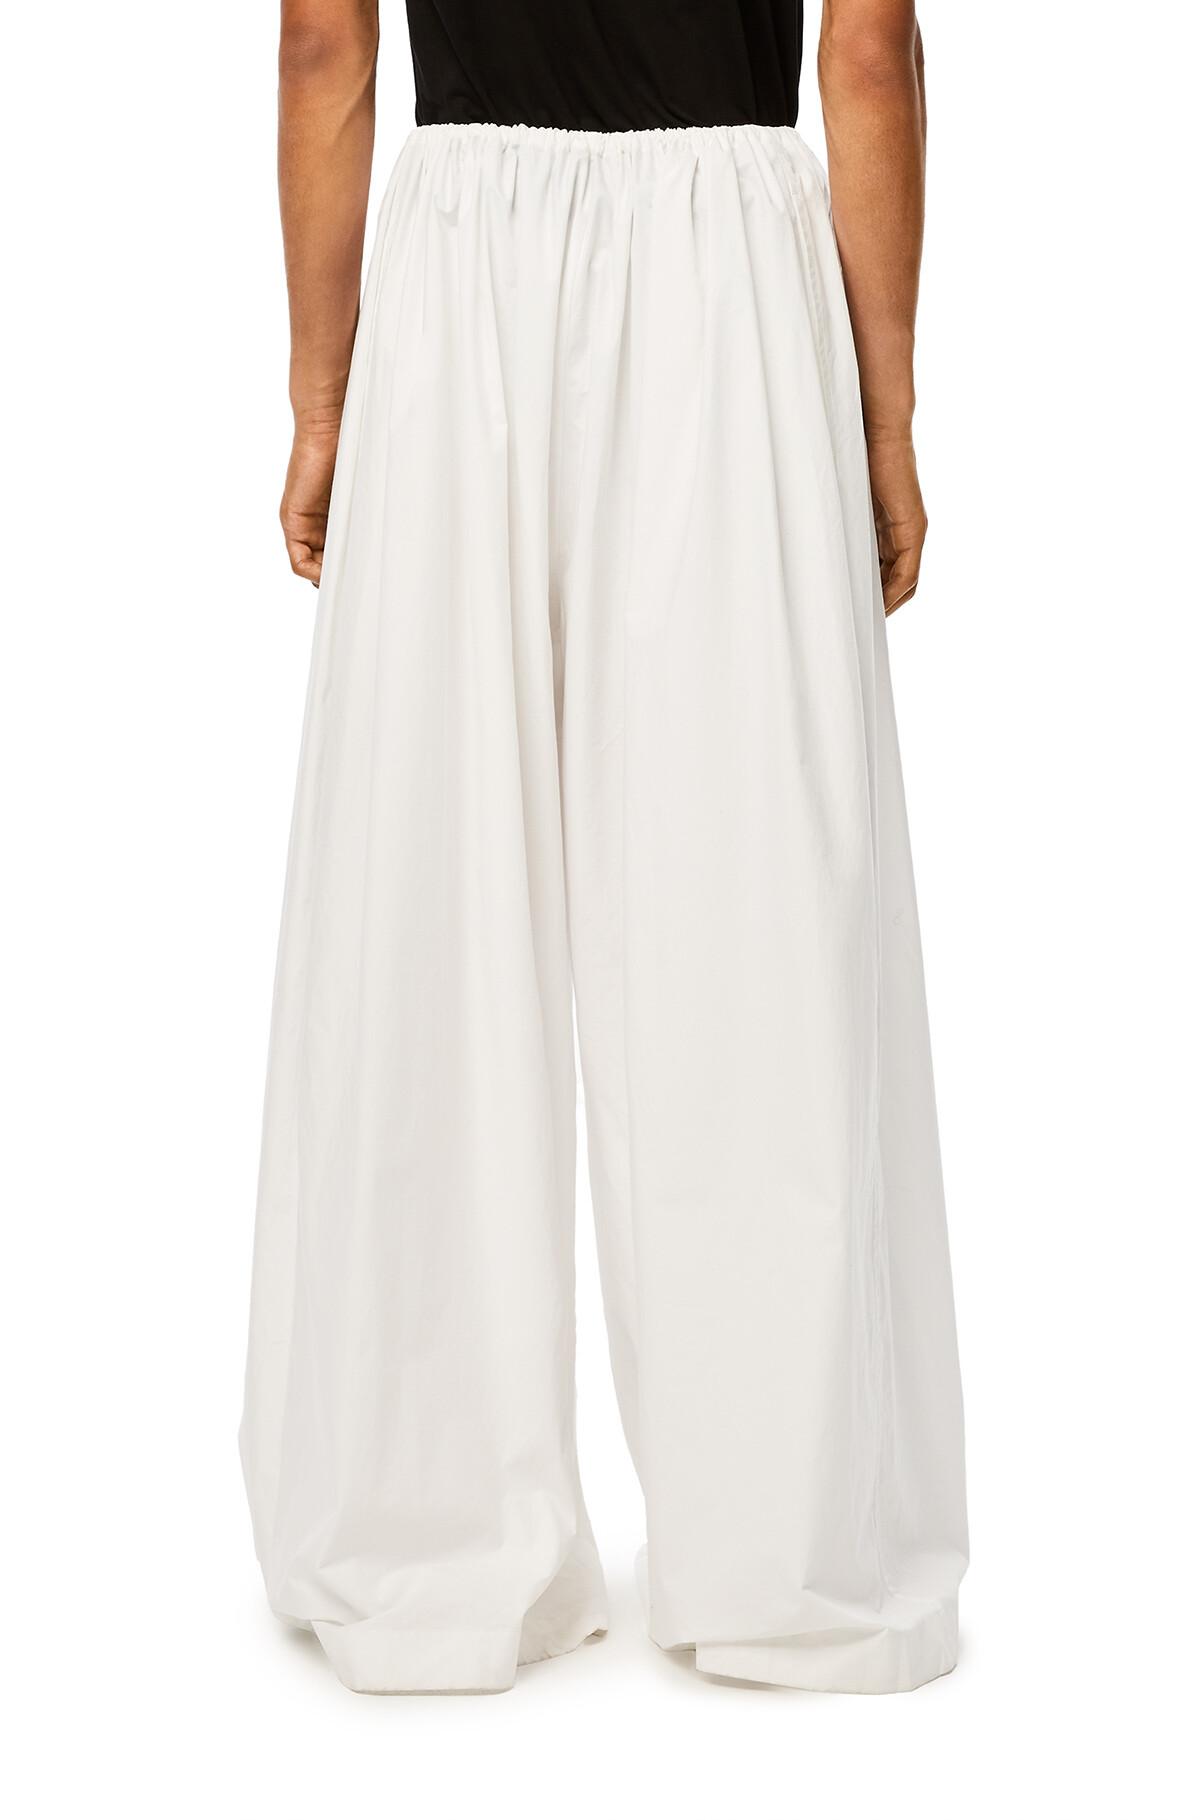 LOEWE Ov Drawstring Trousers White front